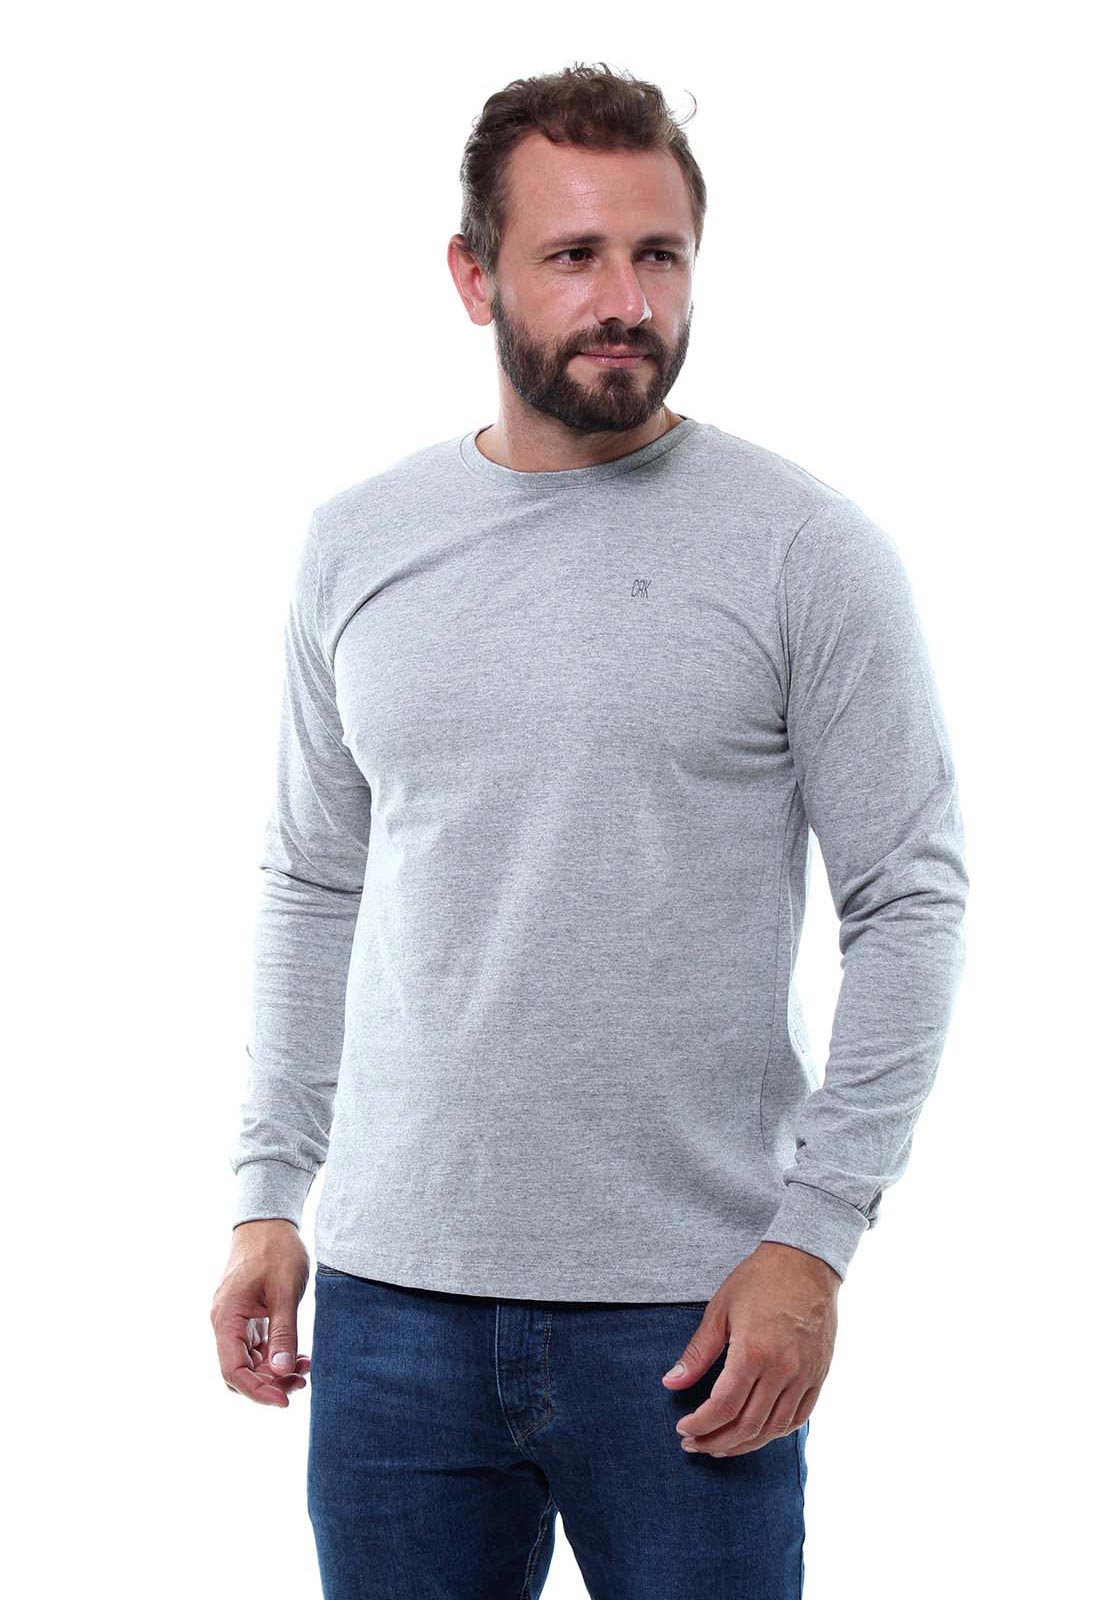 Kit 3 Camiseta Masculina Básica Crocker - 47661 Cores Variadas  - CROCKER JEANS